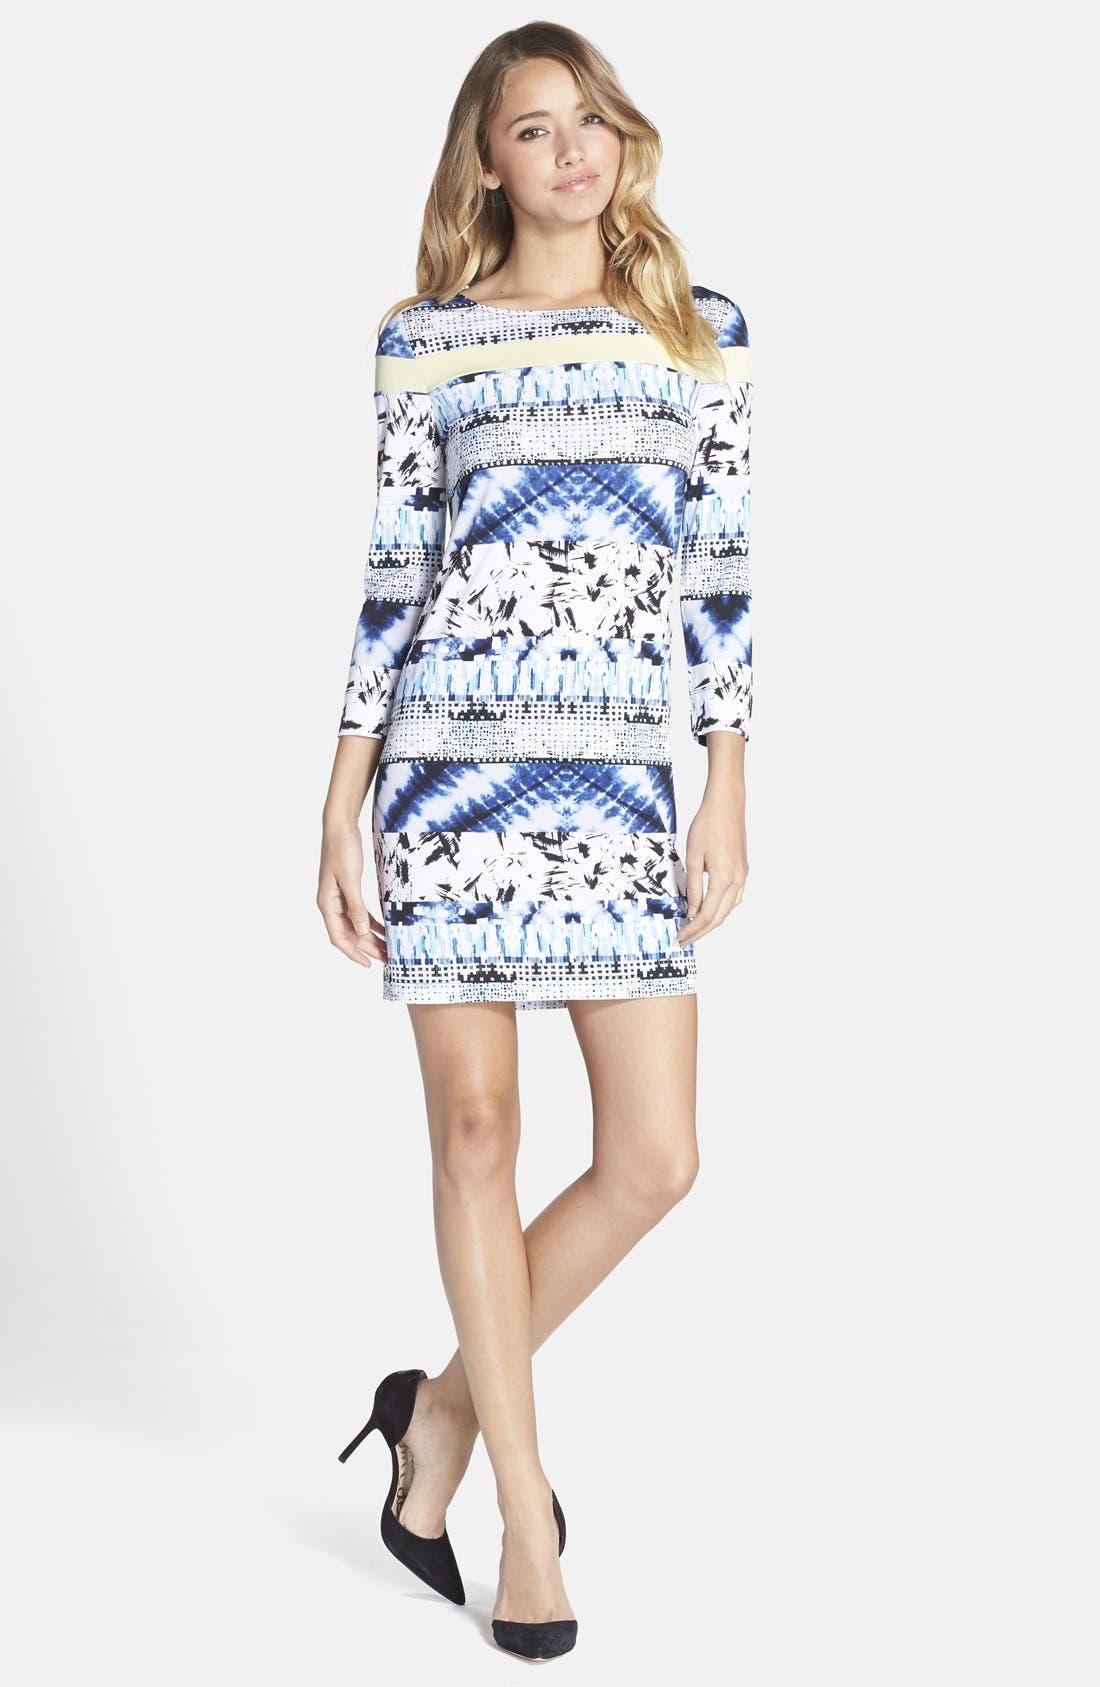 Alternate Image 1 Selected - BCBGMAXAZRIA Mixed Print Jersey Shift Dress